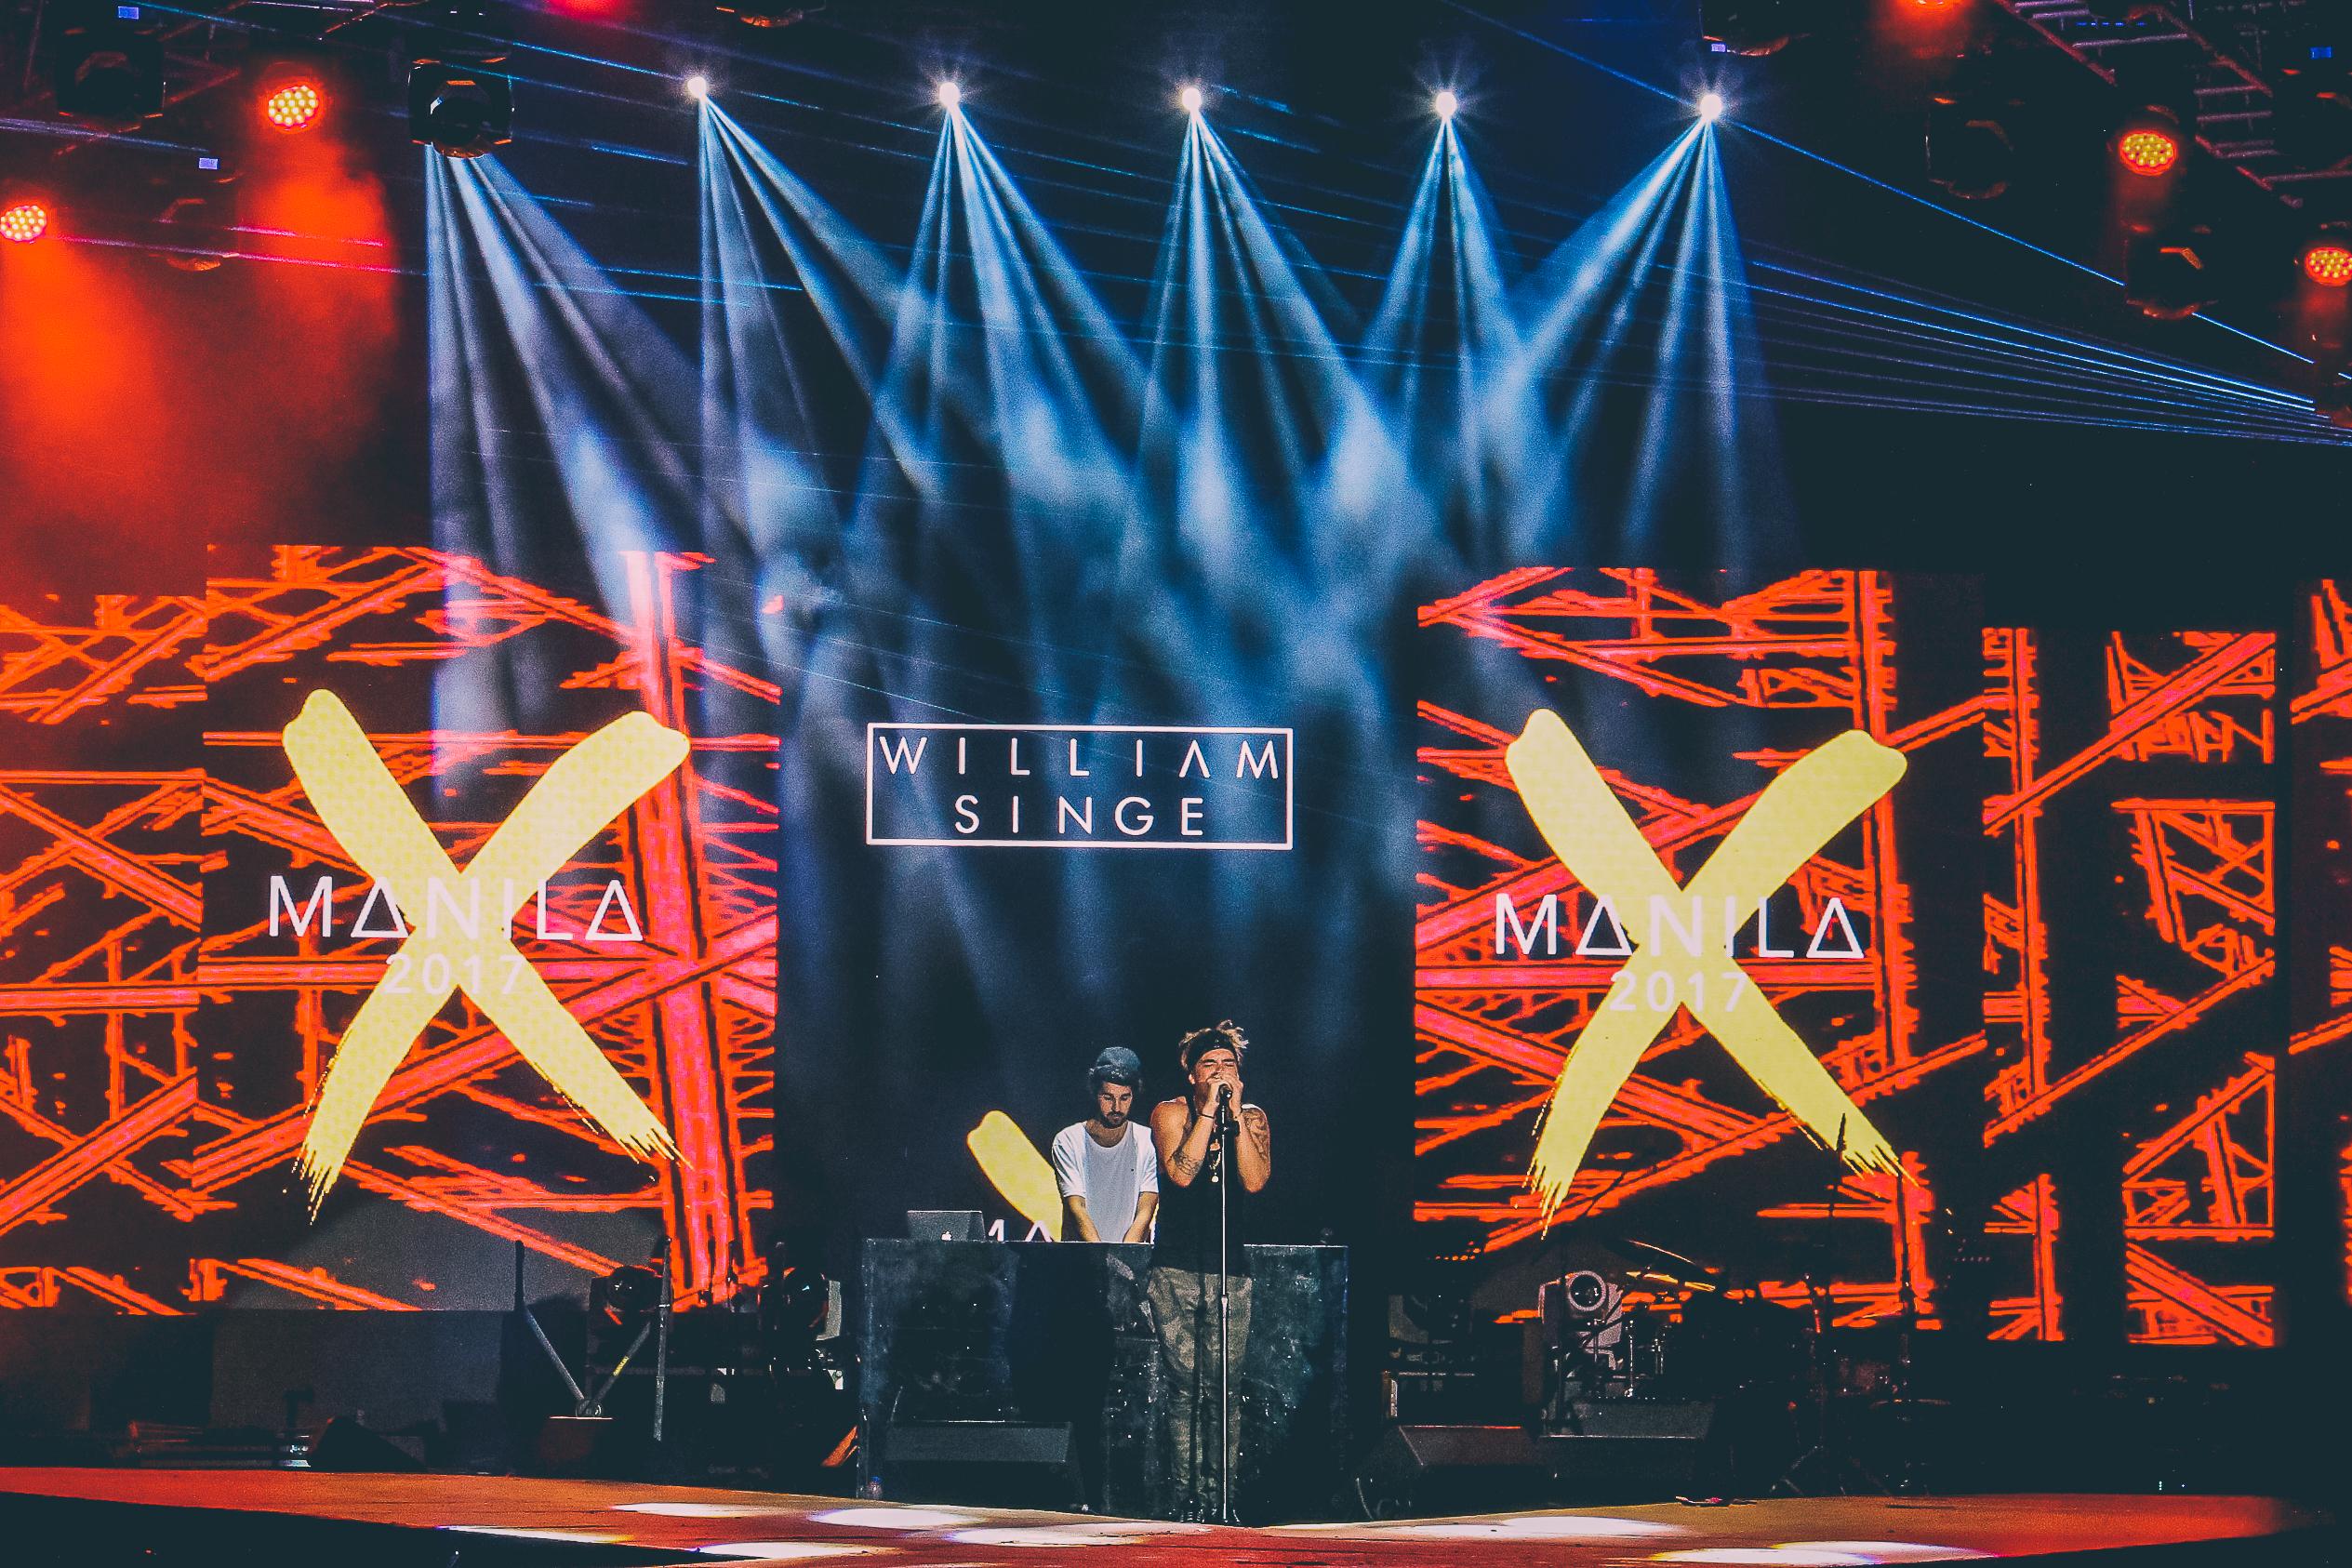 MANILA X 2017